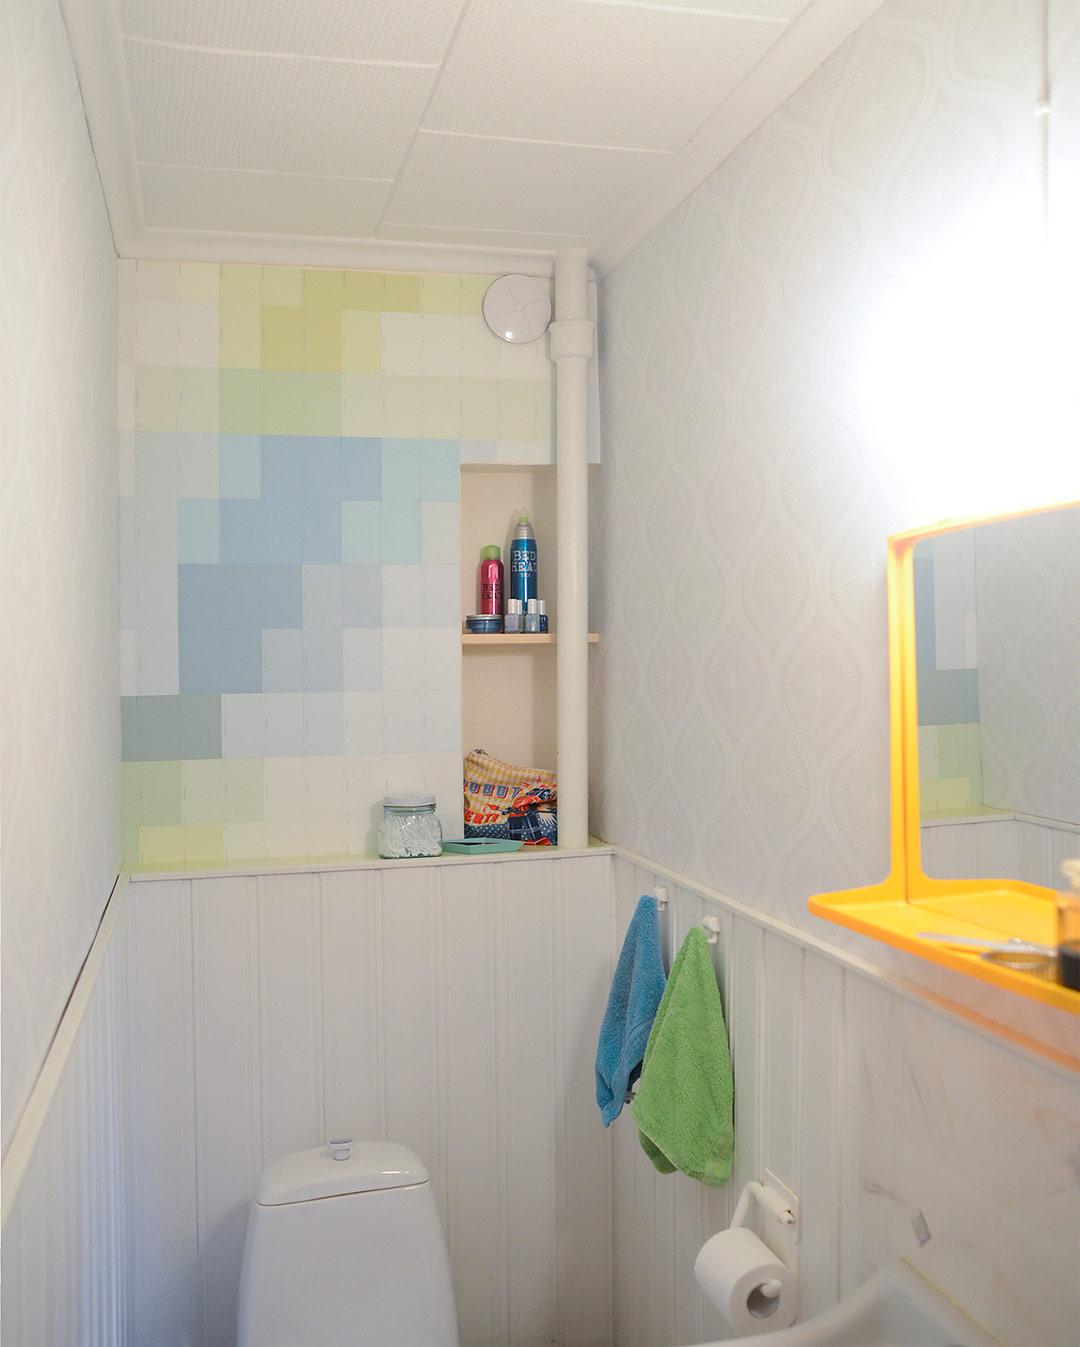 Paint chip wallpaper DIY by Jutta Rikola for Unelmien Talo&Koti magazine